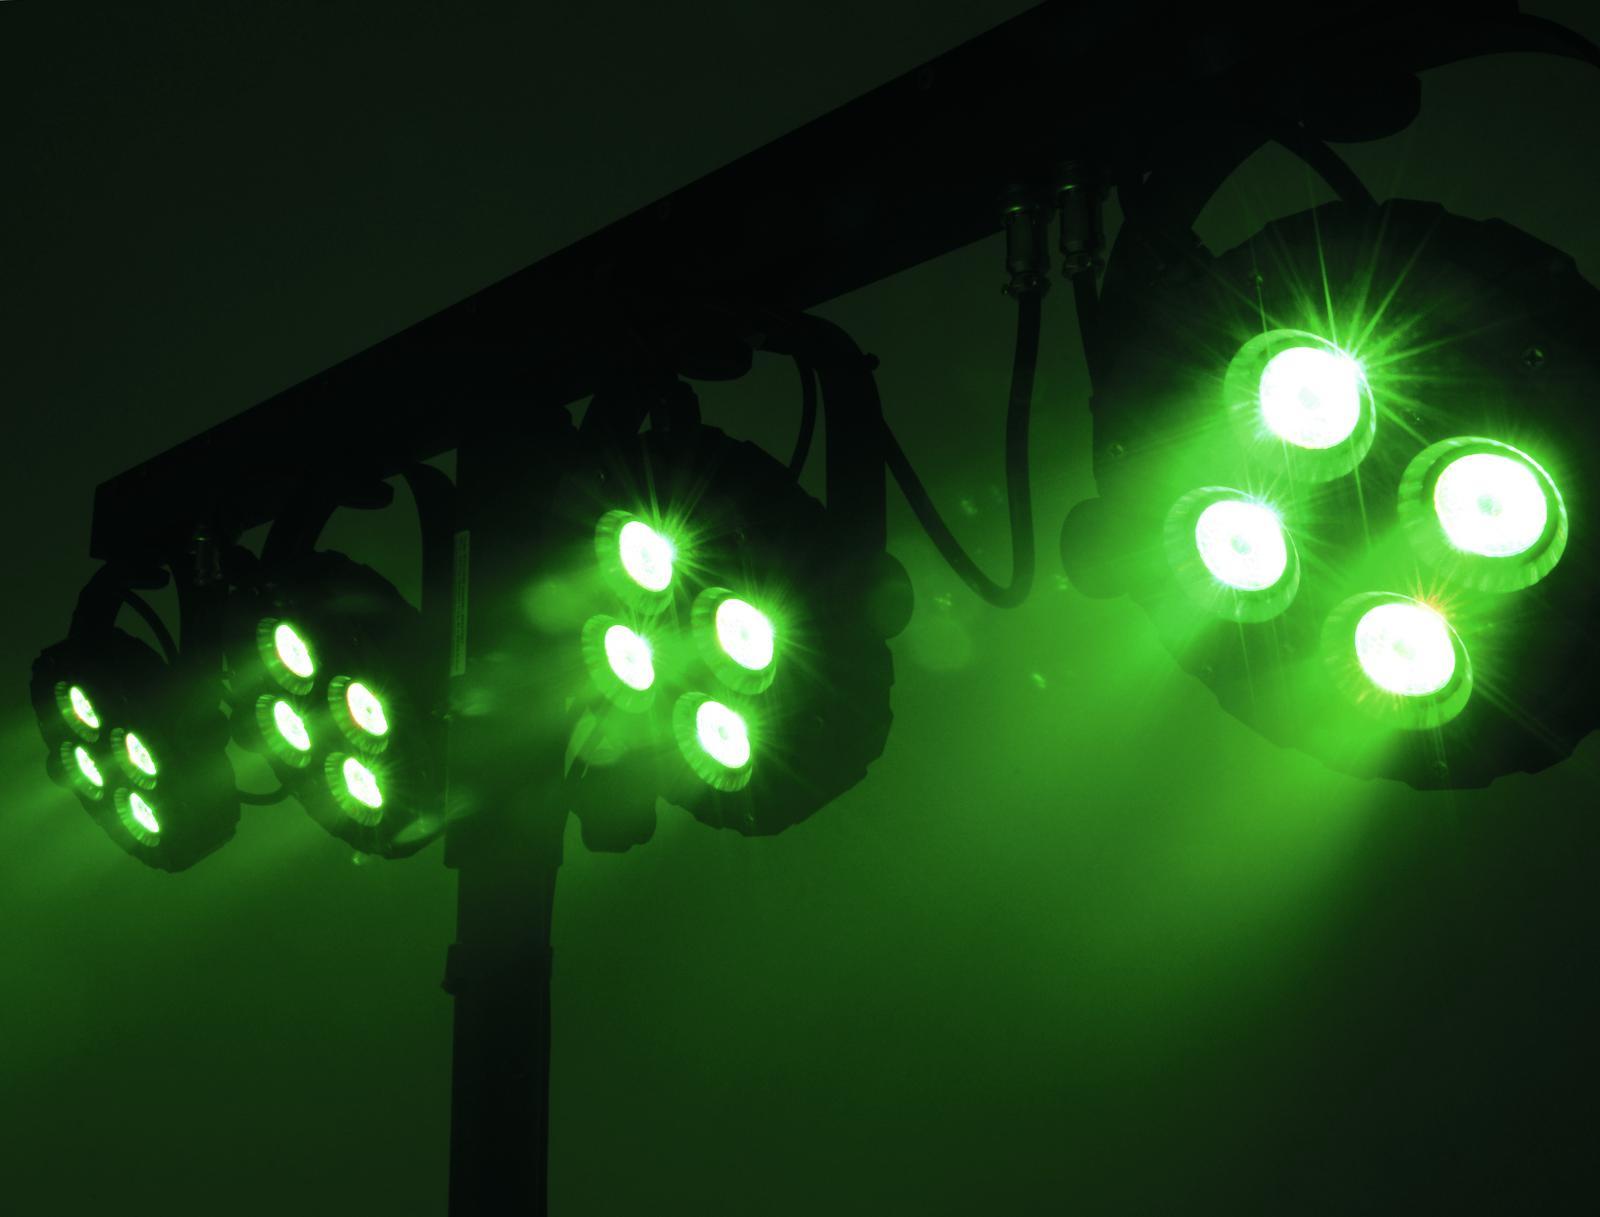 EUROLITE LED KLS-160 Compatto e leggero